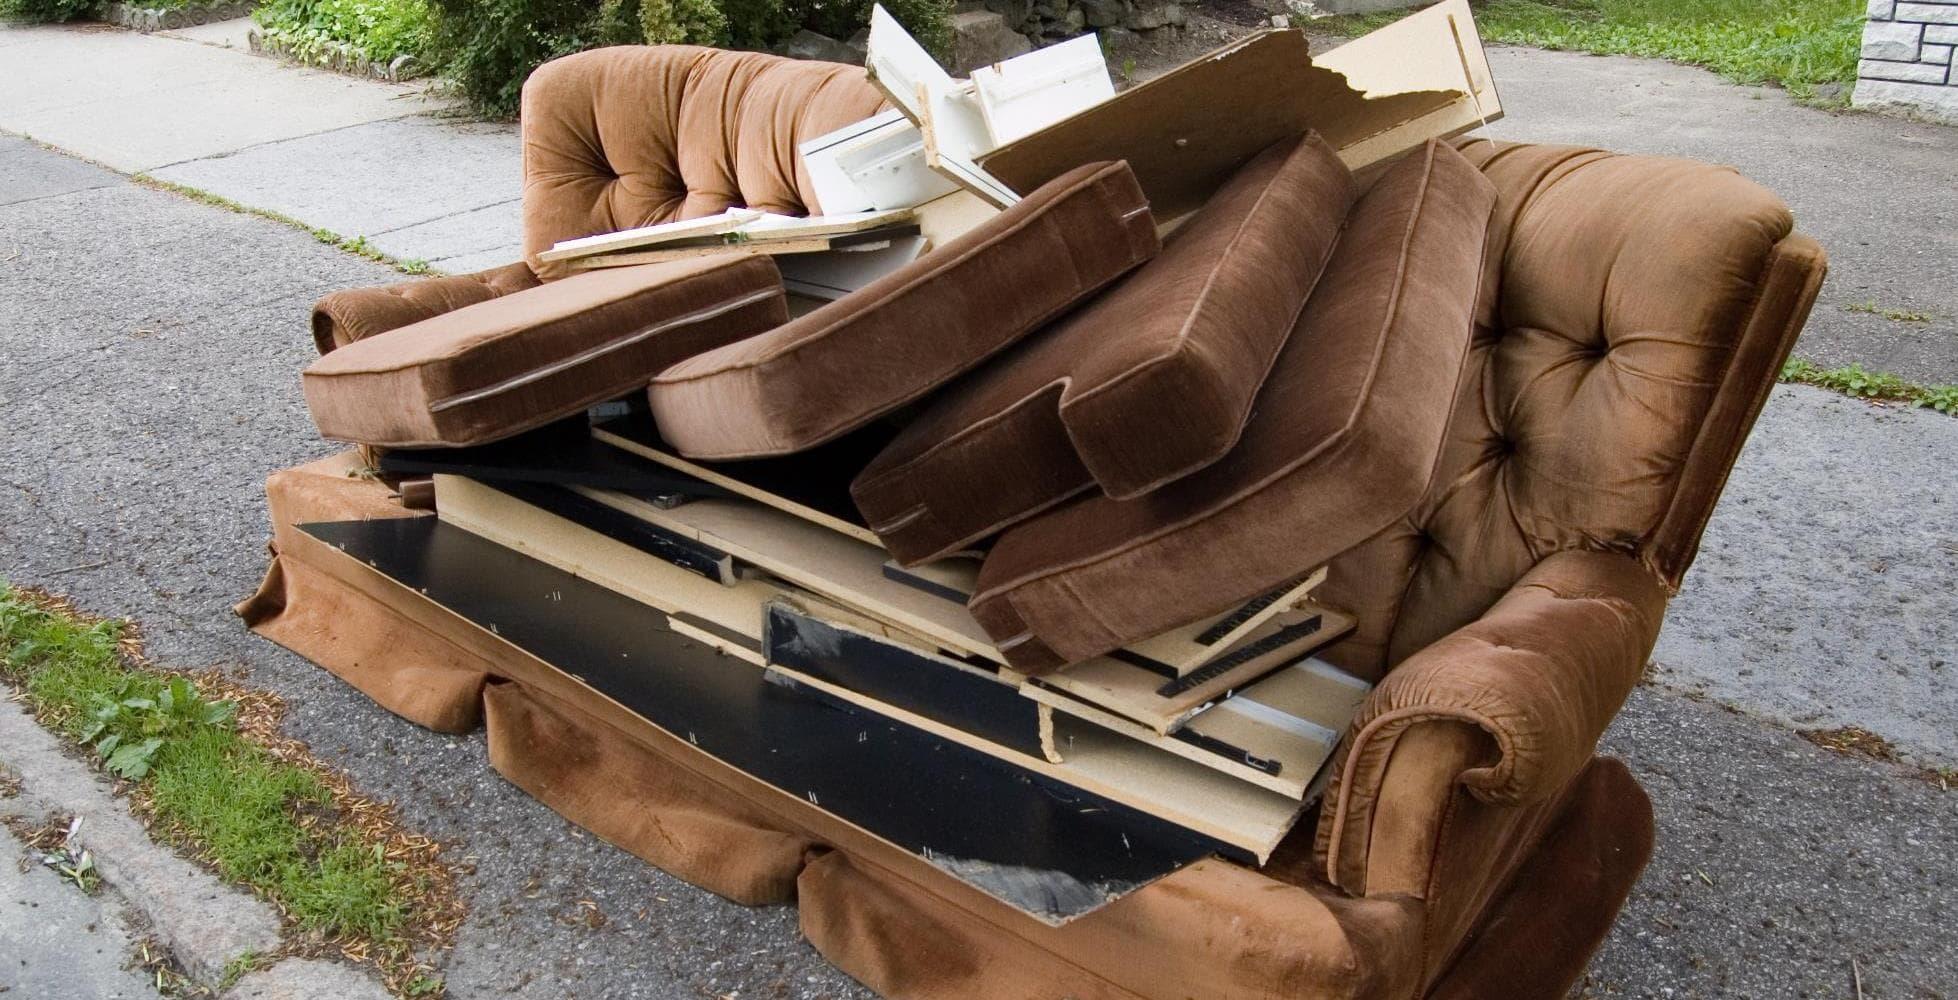 hard waste - Вывоз дивана на утилизацию